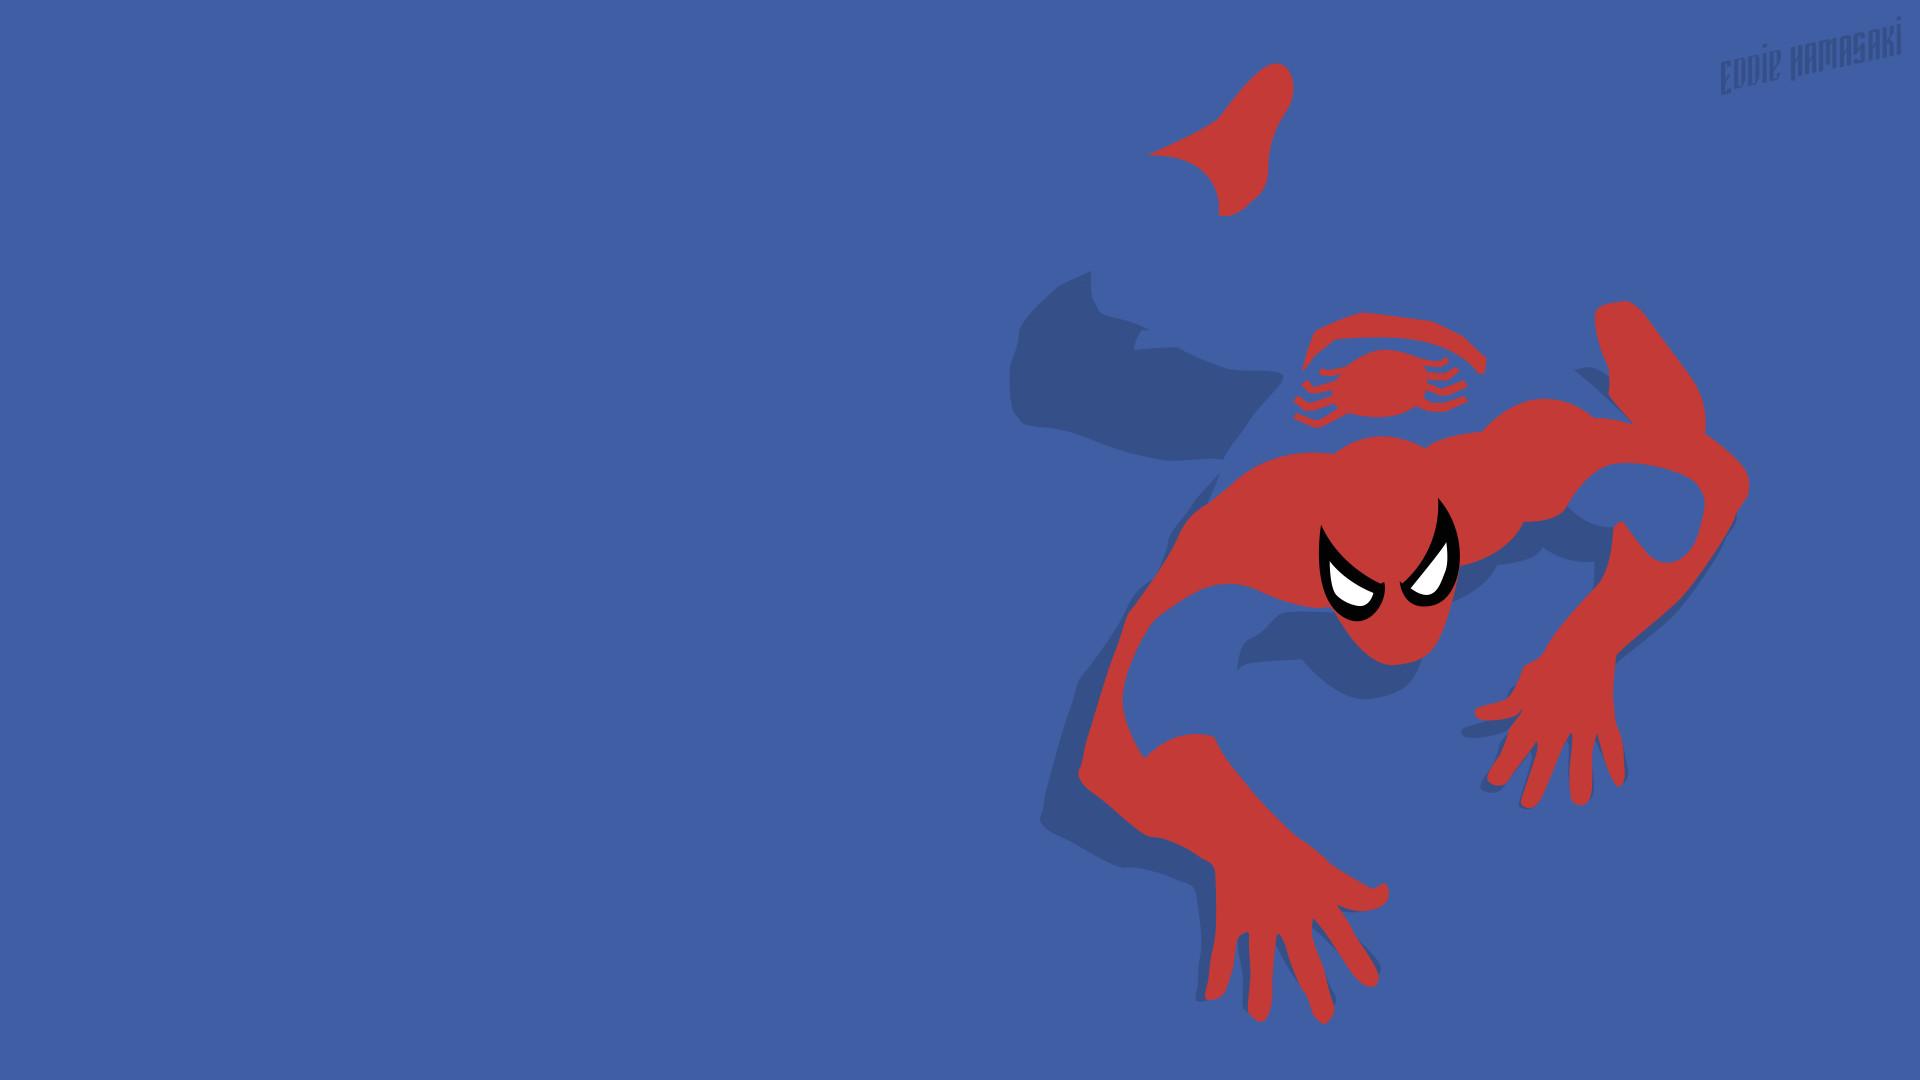 Spiderman minimalistic by eddiehamasaki Spiderman minimalistic by  eddiehamasaki